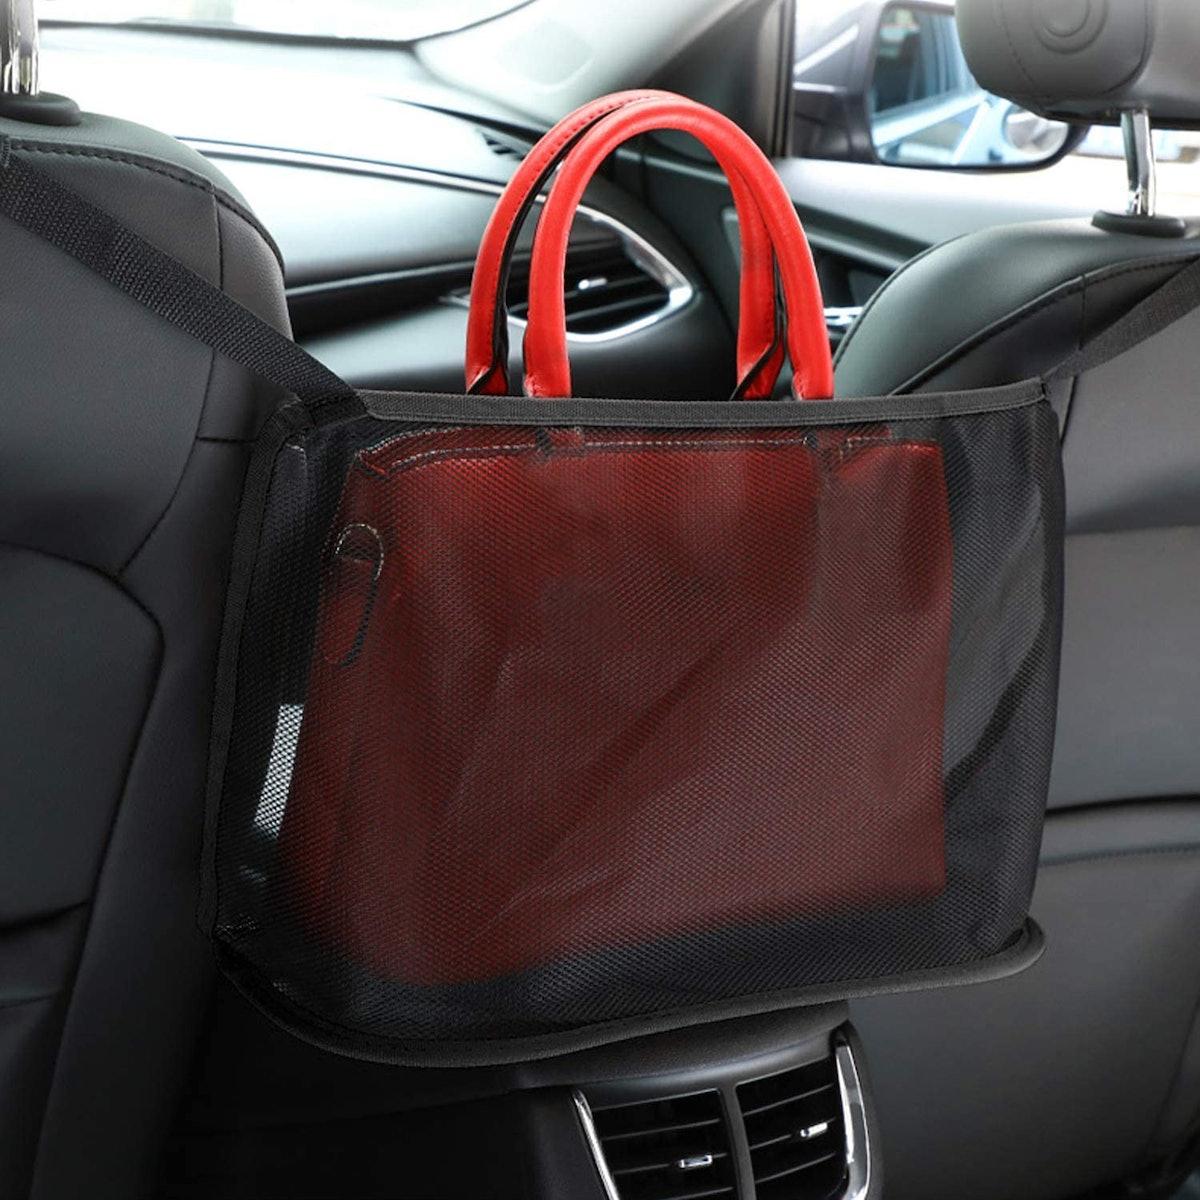 JASSINS Car Pocket Organizer